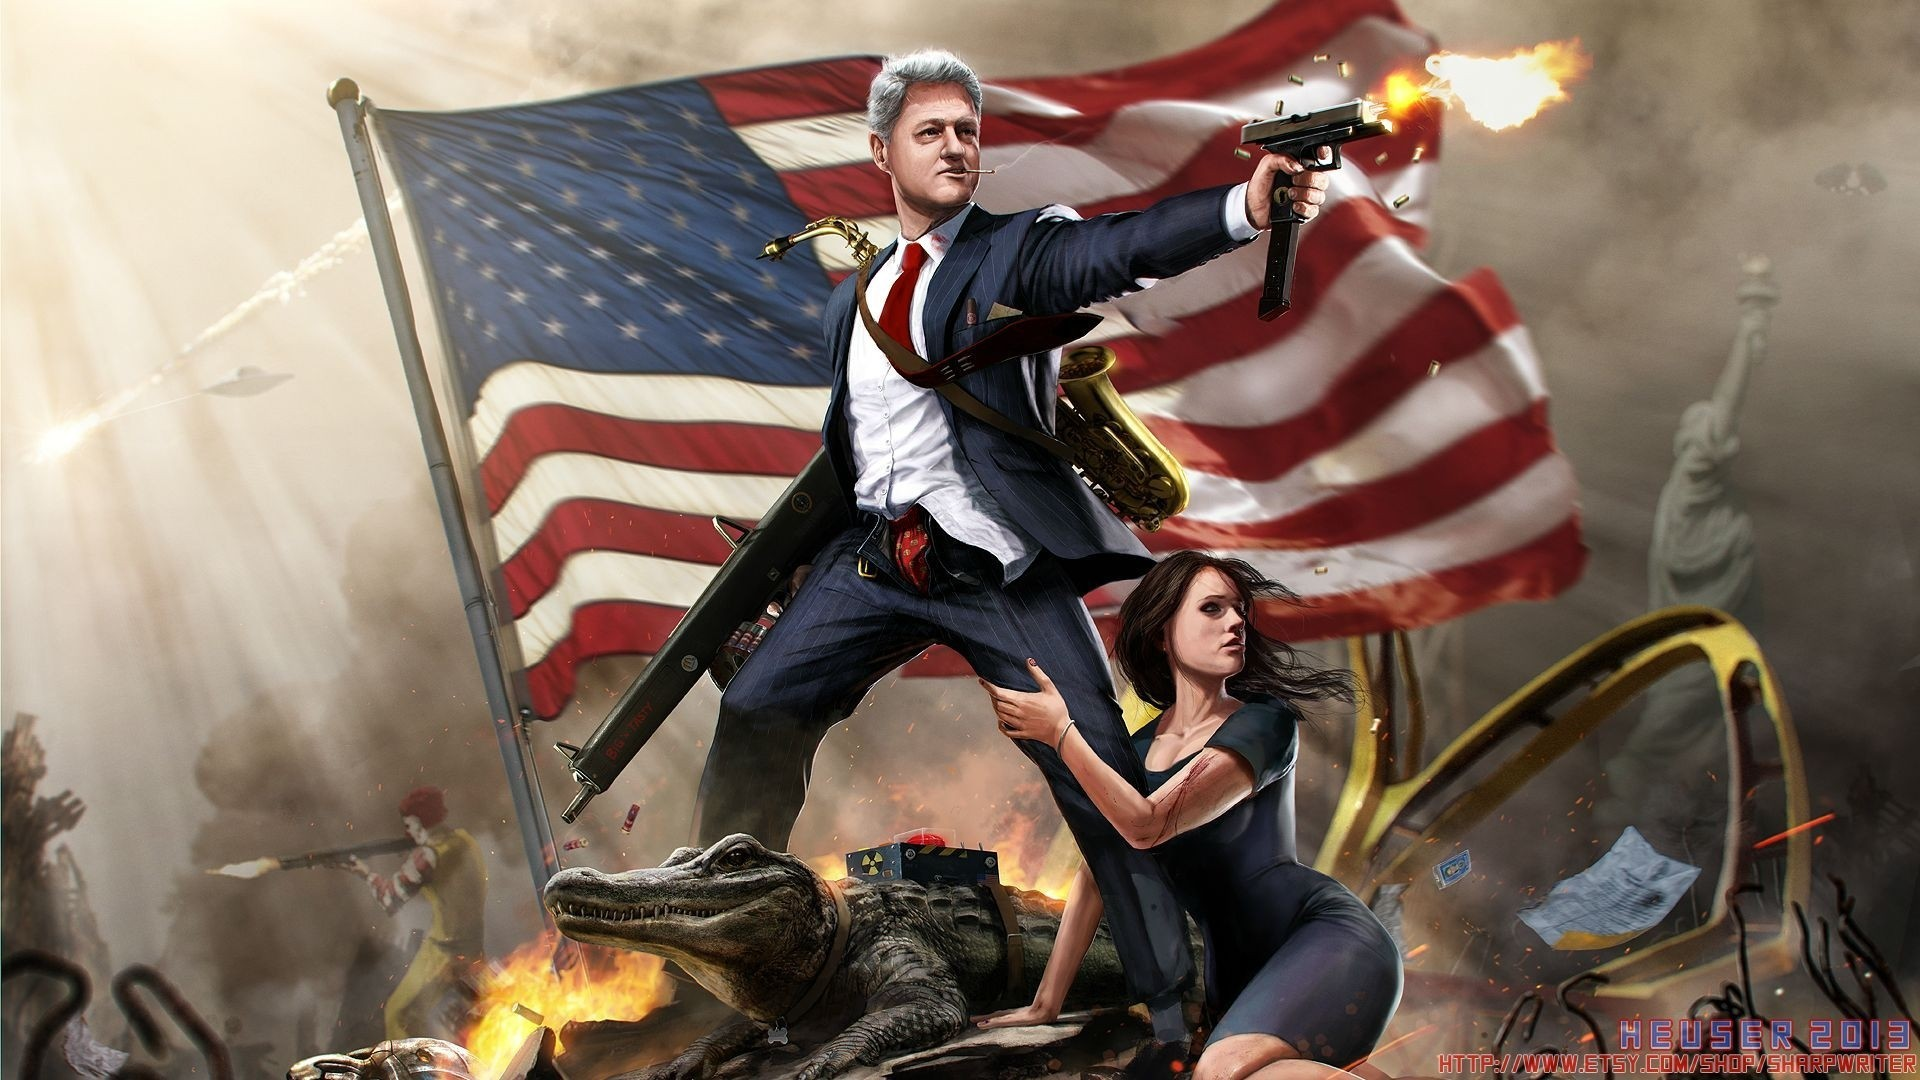 My favorite president wallpapers